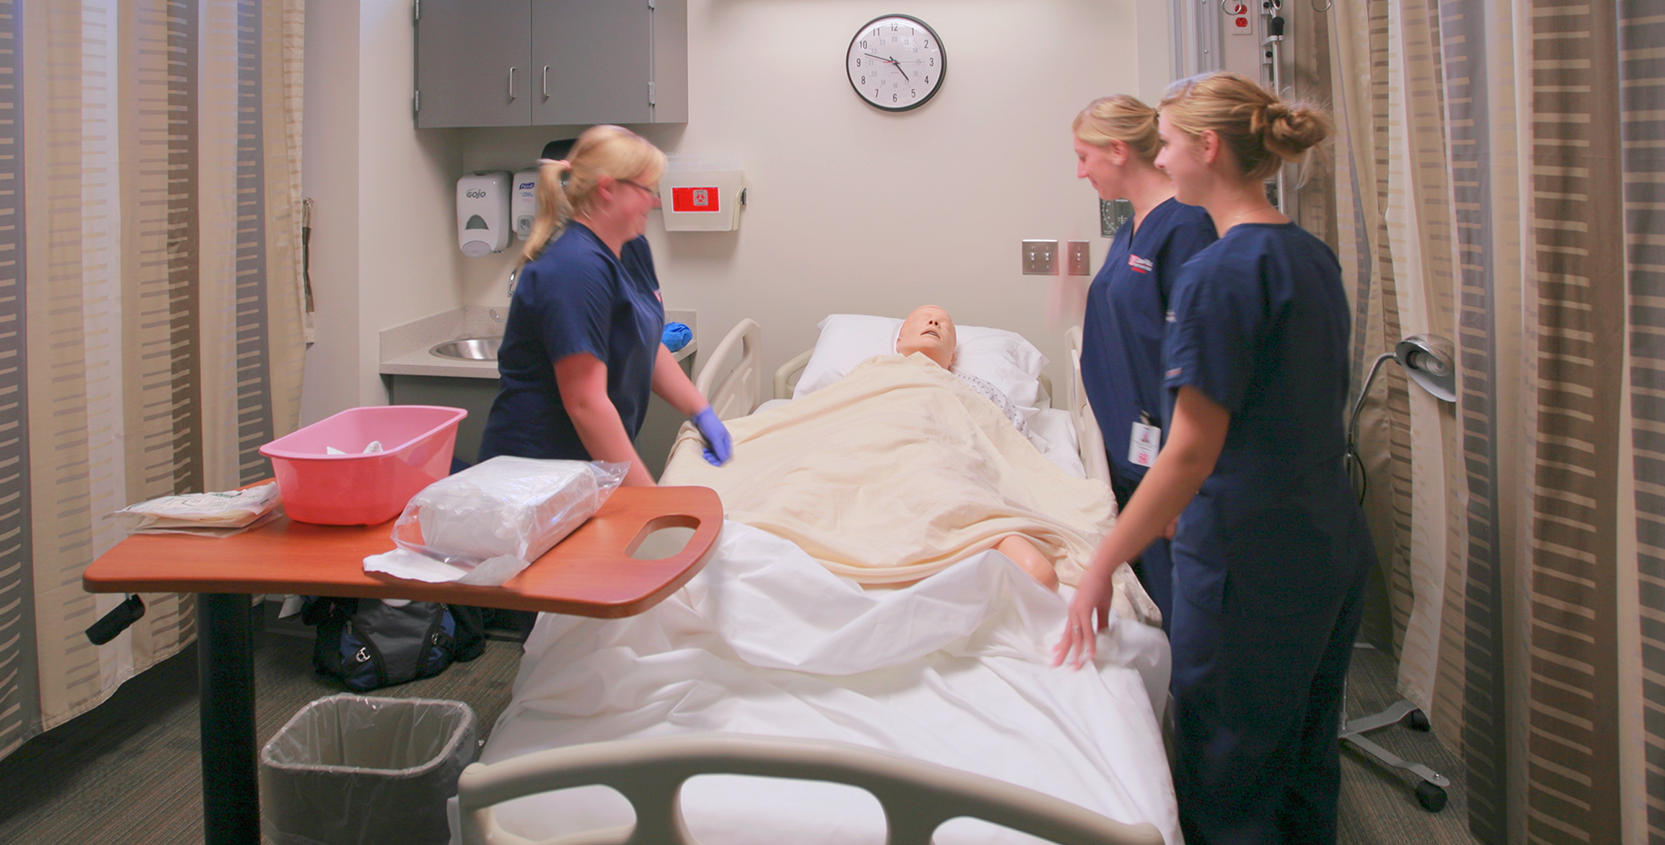 SVSU-CHHS-Mock-Patient-Room-2-1665x845